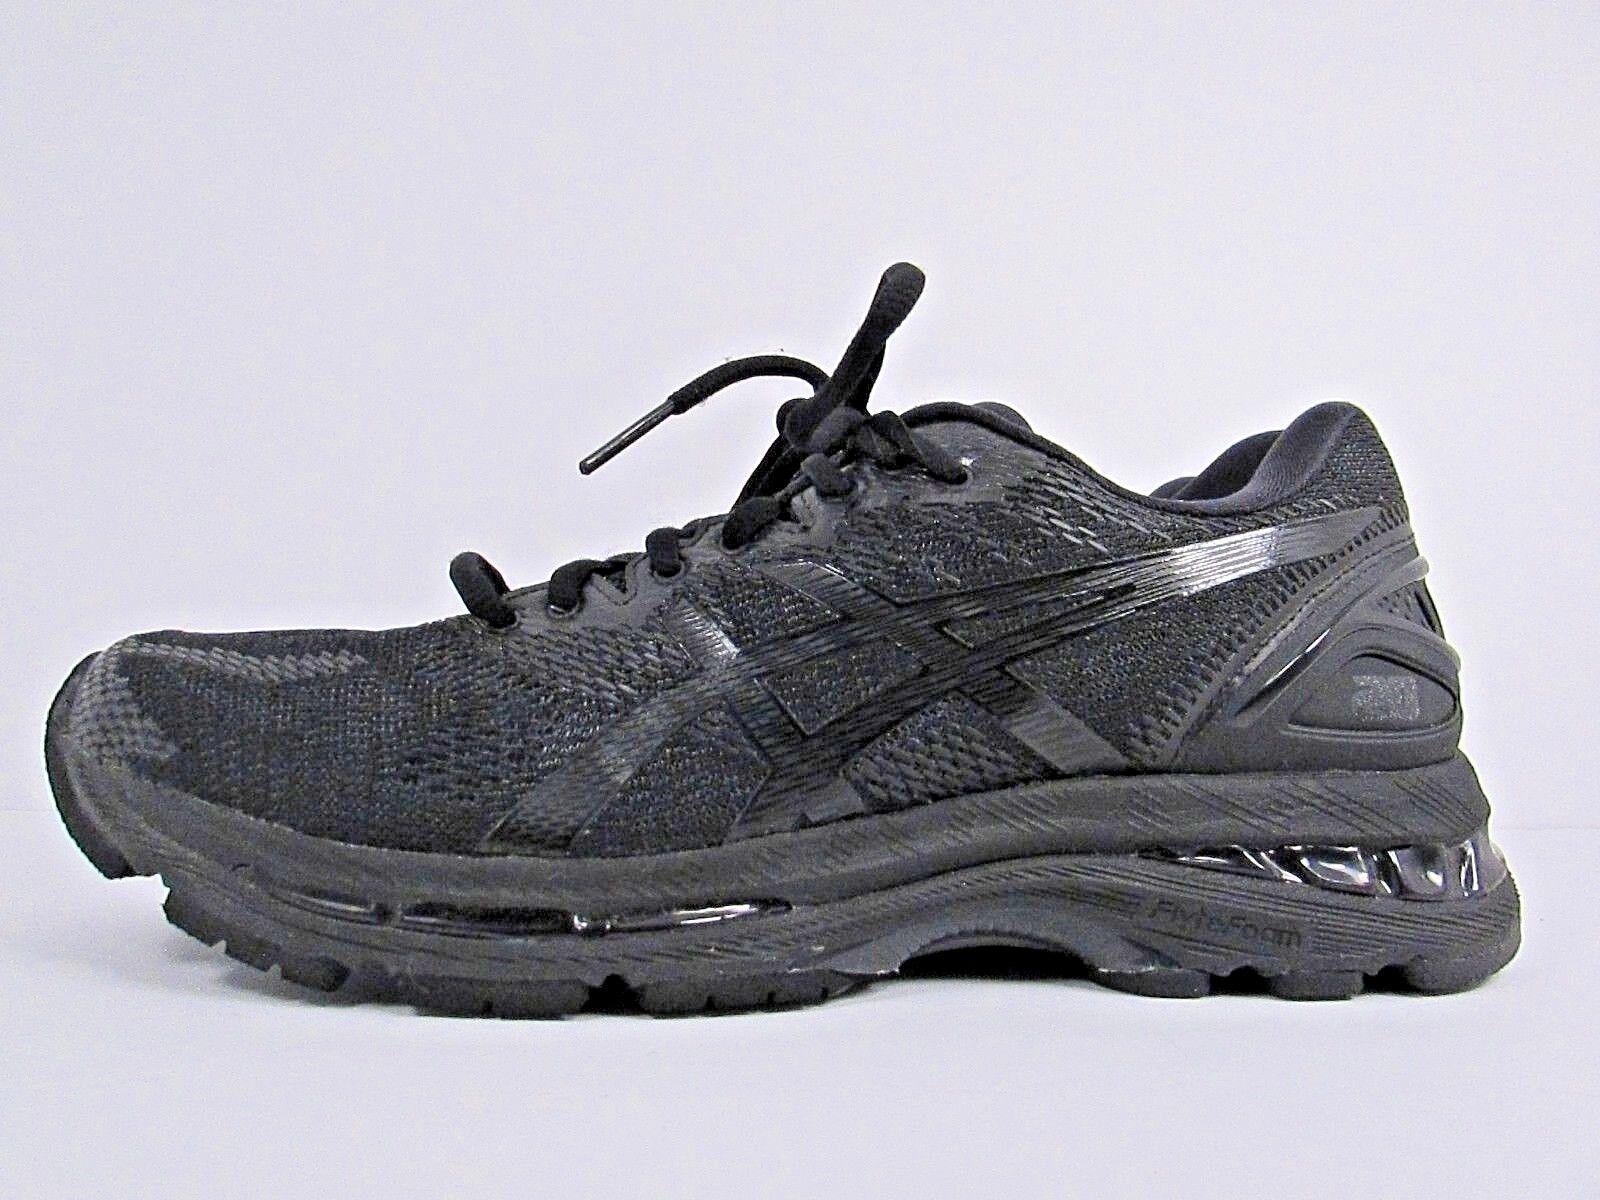 donna ASICS GEL GEL GEL NIMBUS 20 Dimensione 9.5   WORN LESS THAN 5 MILES  RUNNING scarpe  2c175f